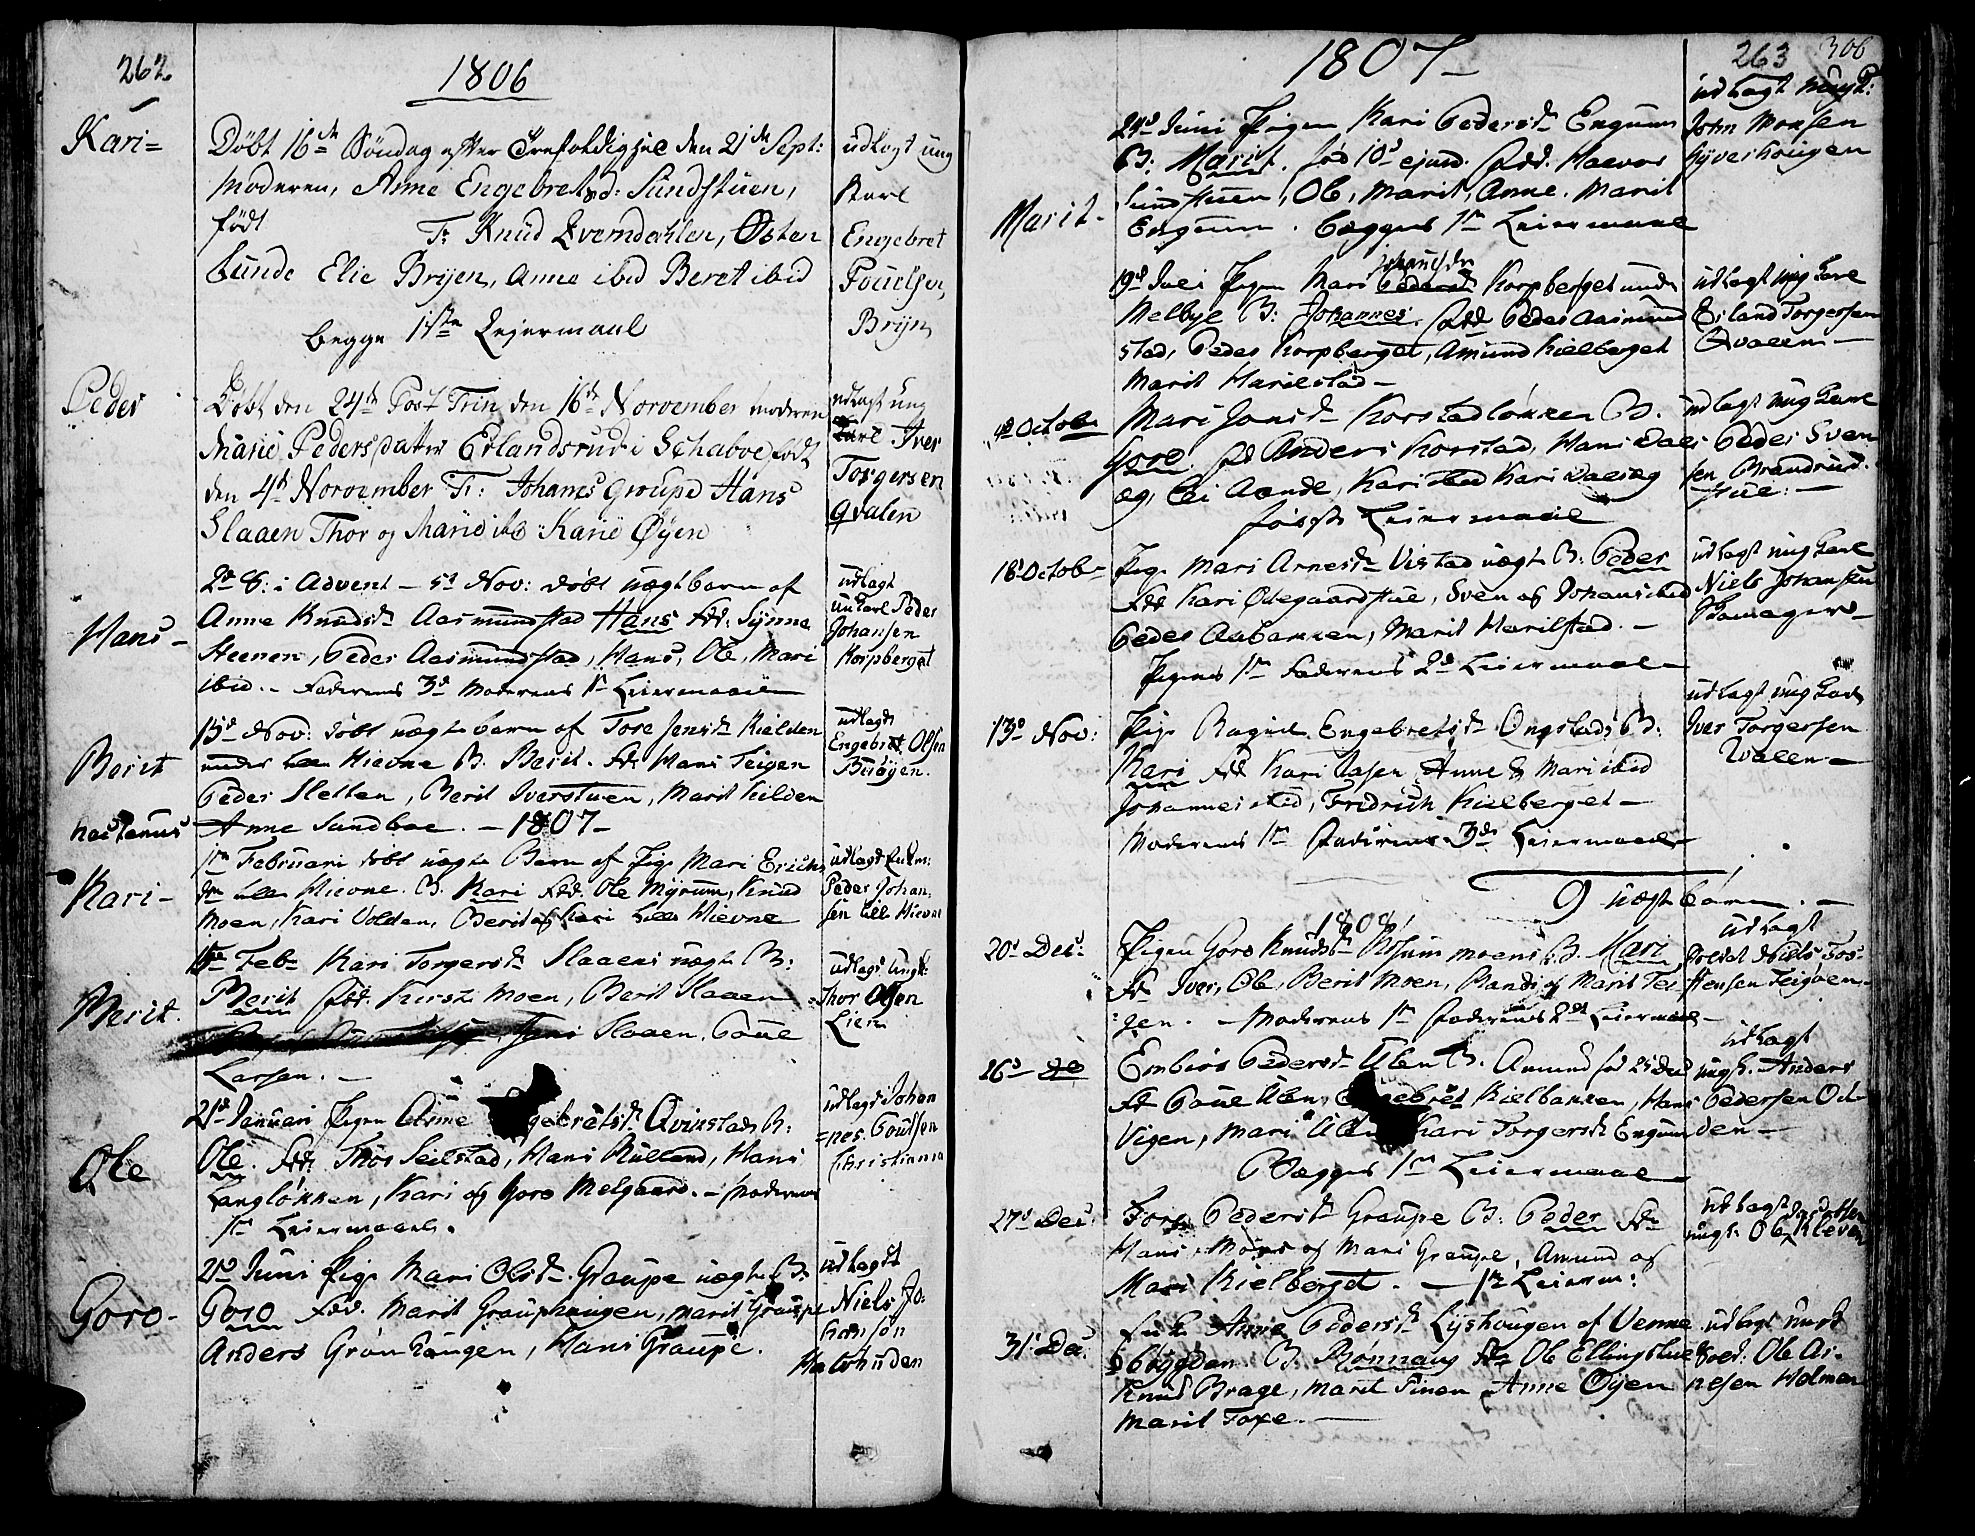 SAH, Fron prestekontor, H/Ha/Haa/L0001: Ministerialbok nr. 1, 1799-1816, s. 262-263